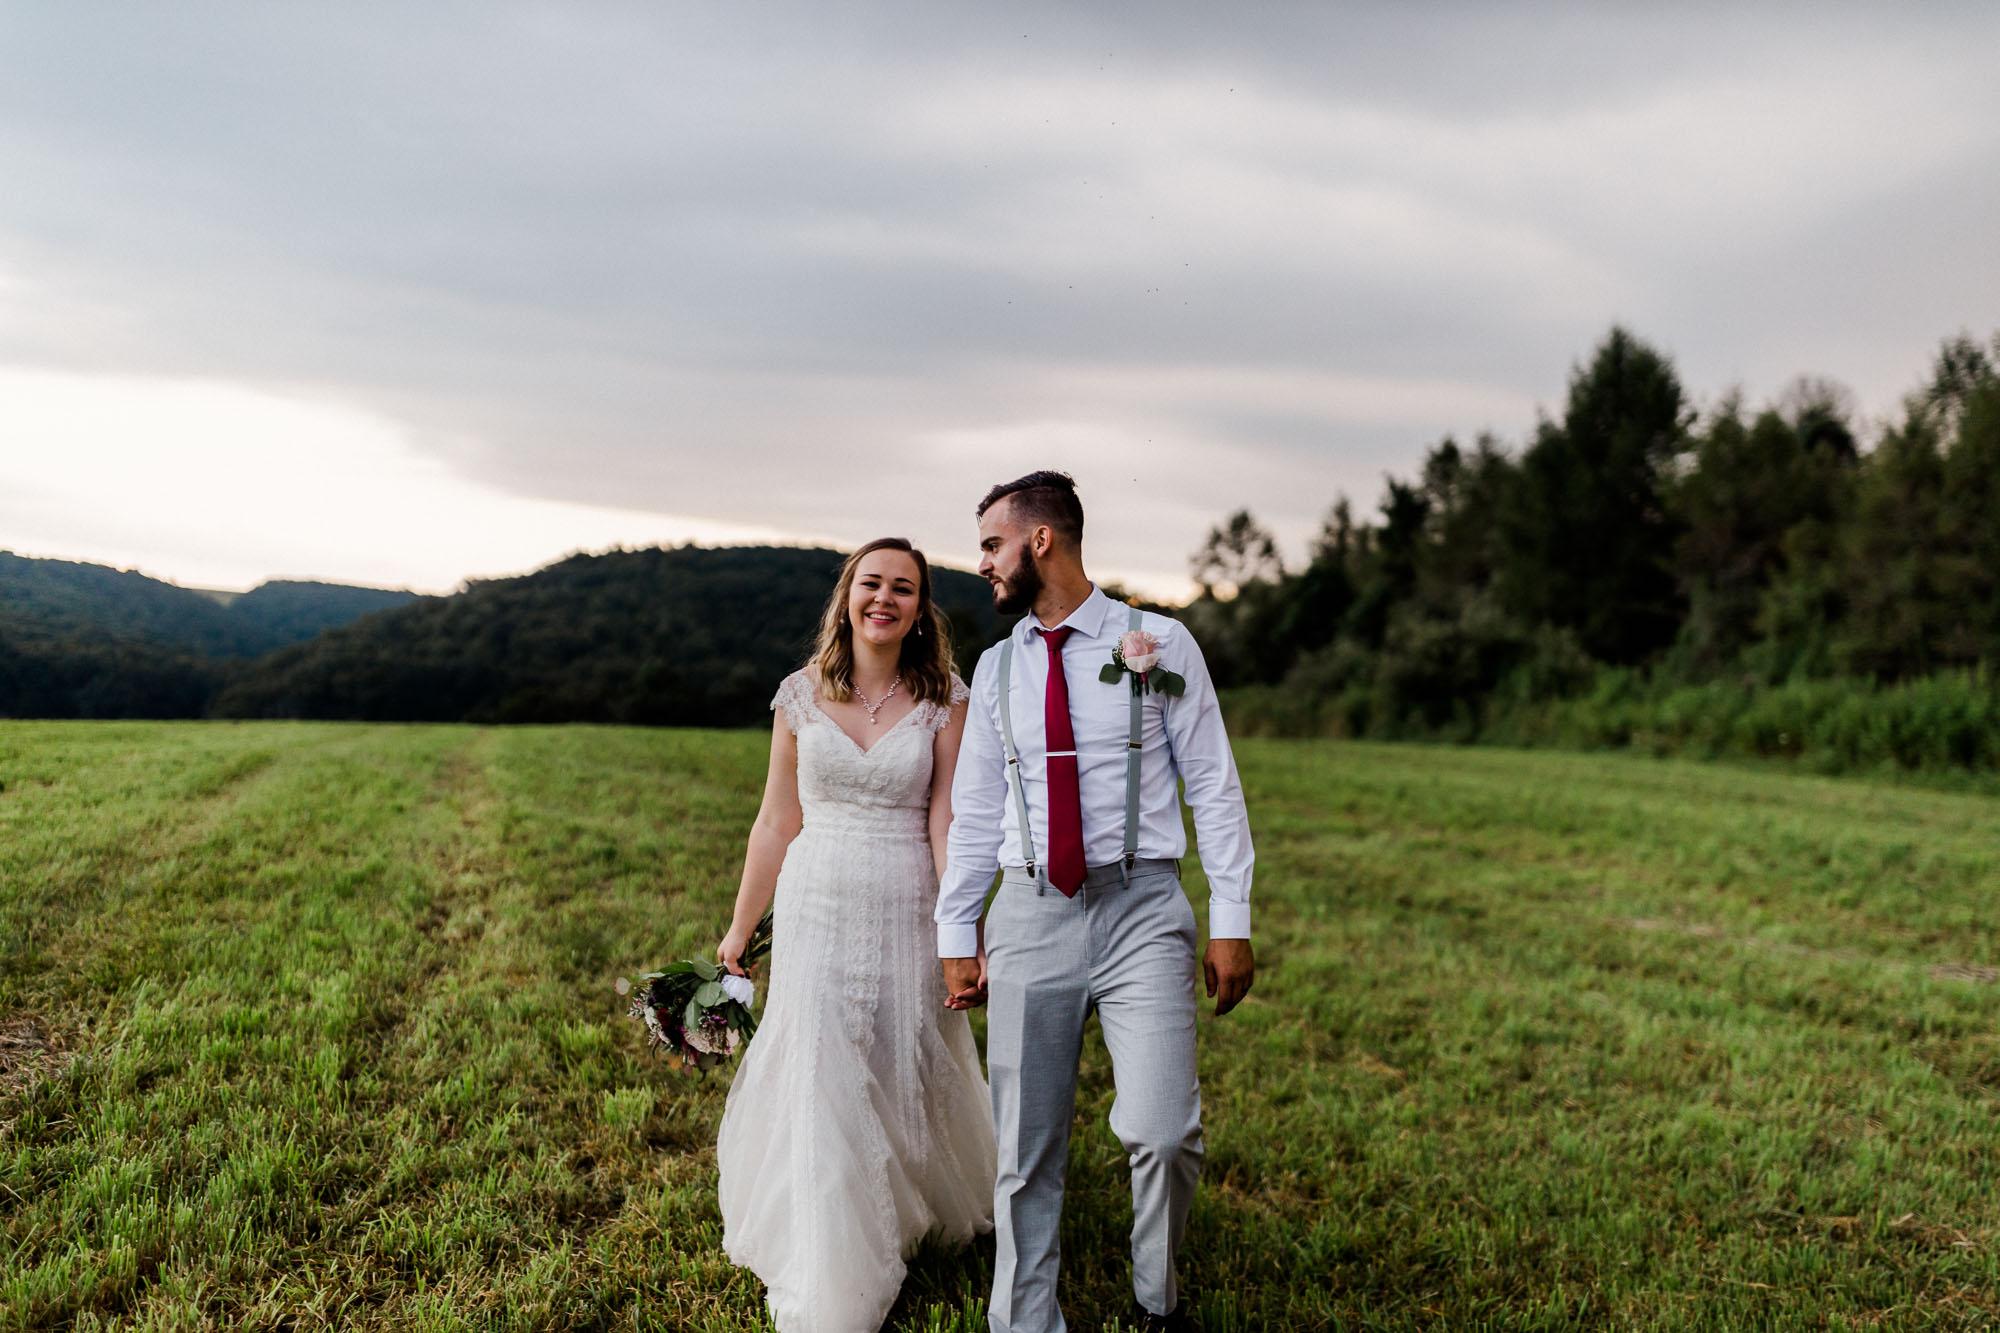 Stillwater-Christian_Church_Wedding-2471.jpg